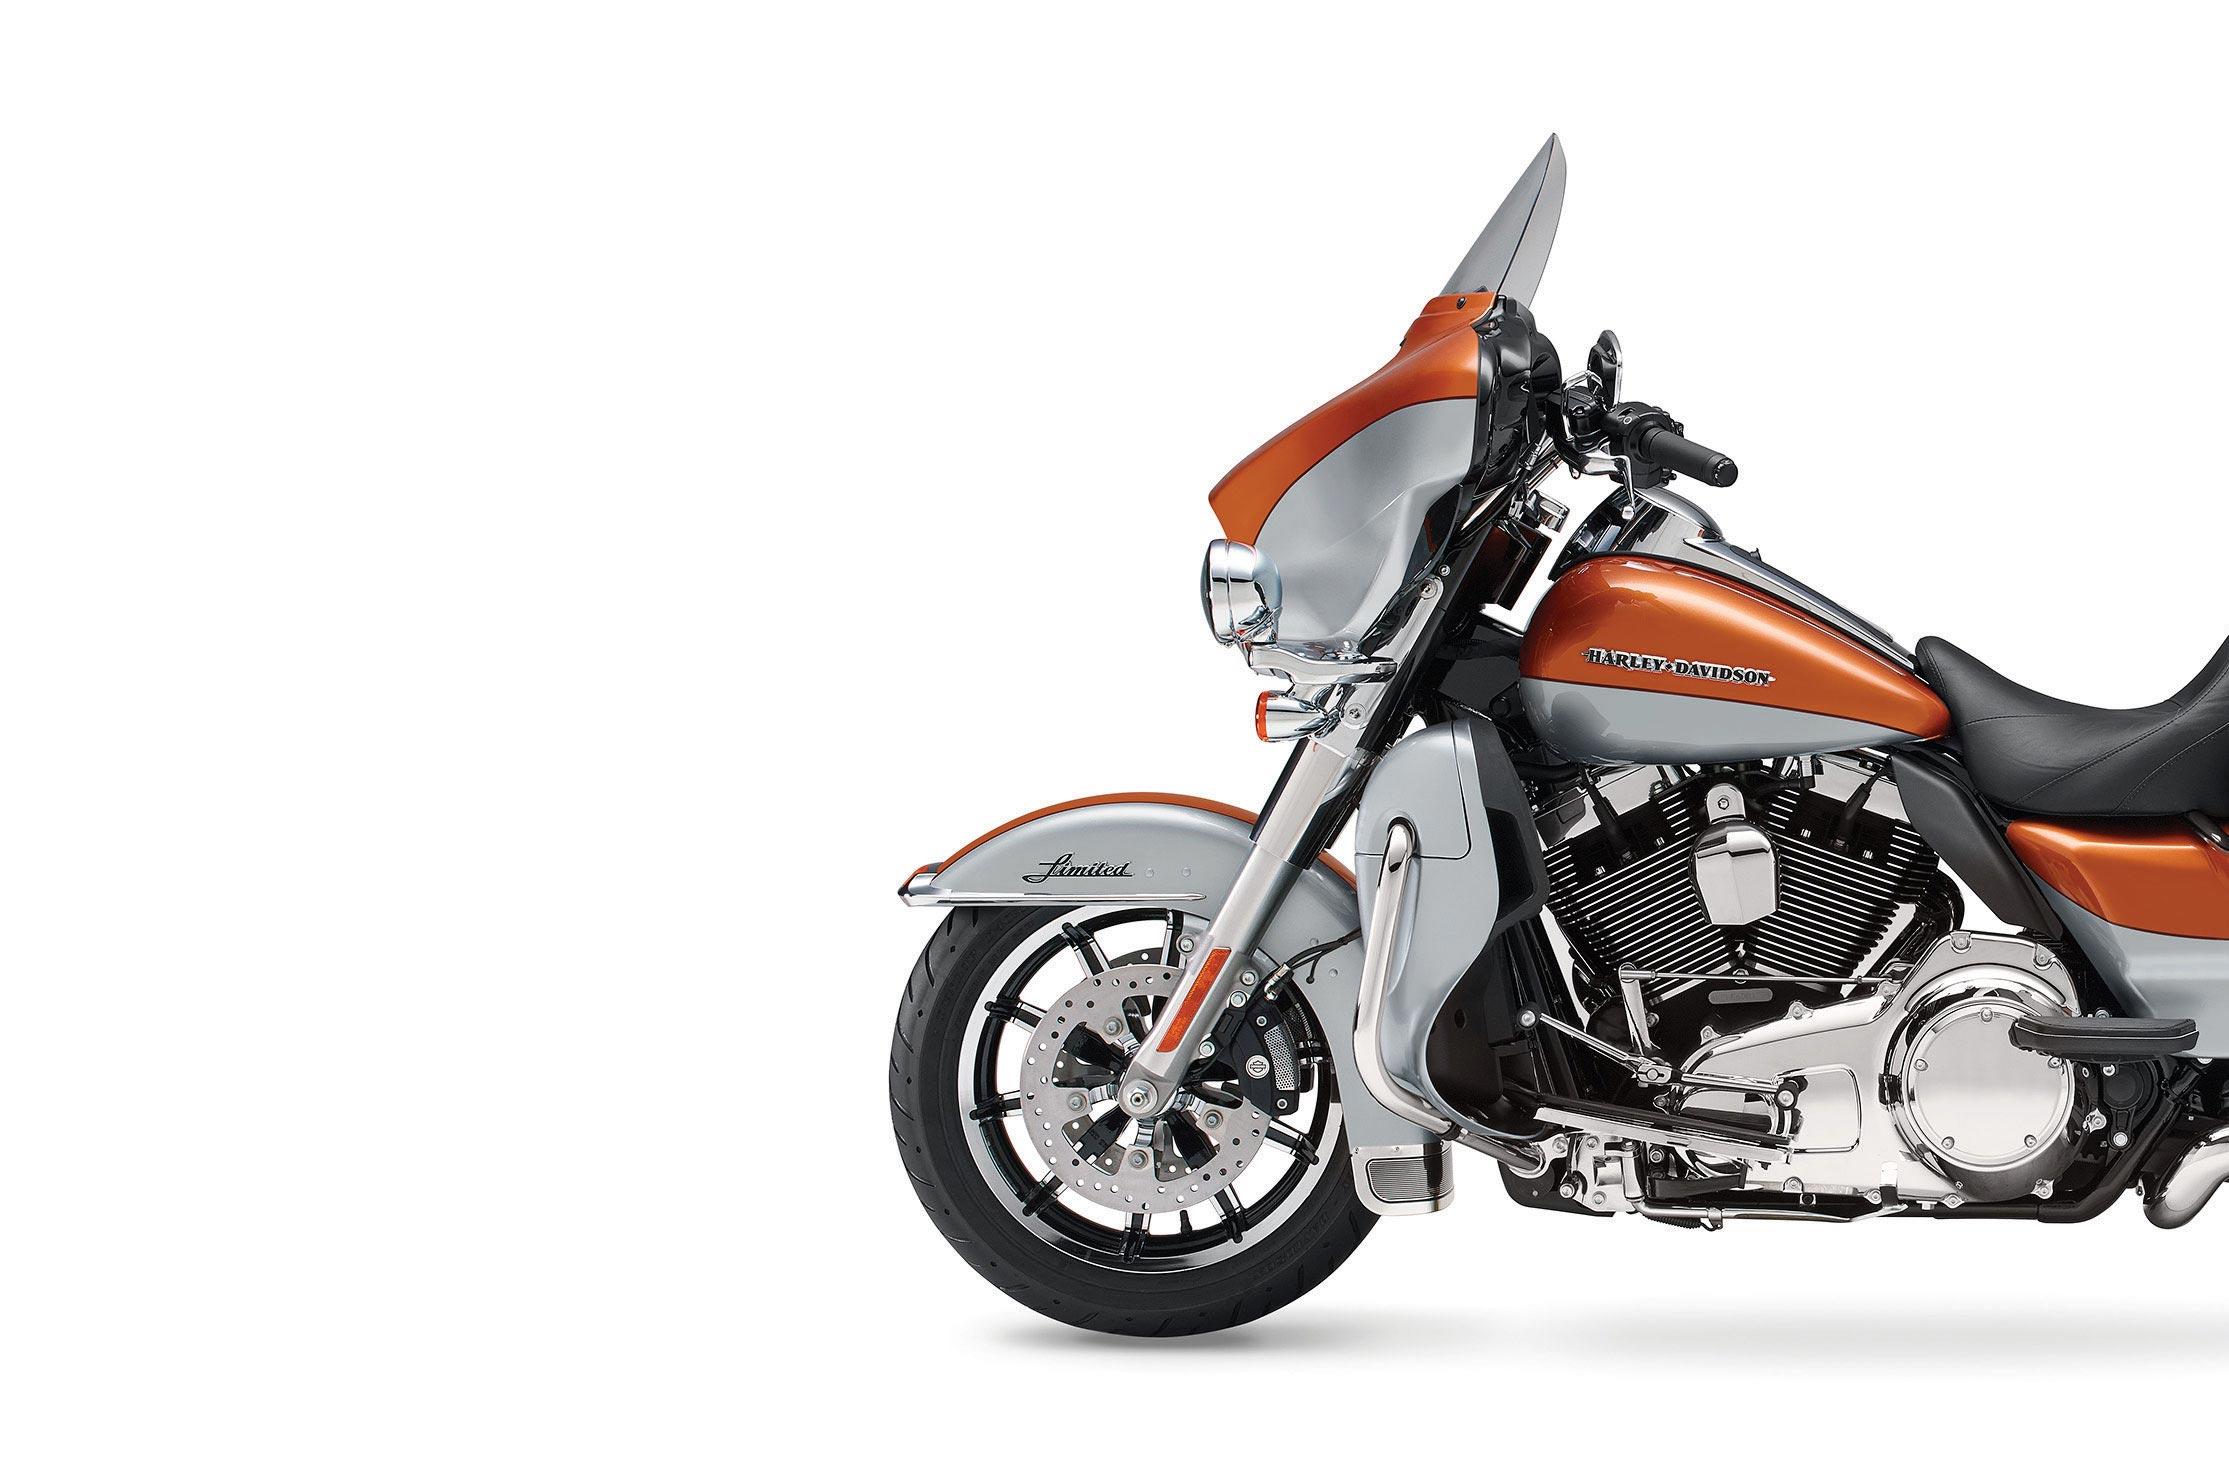 Recall Harley Davidson Night Rod Special: Harley-Davidson Recalling 174,000 Motorcycles Because